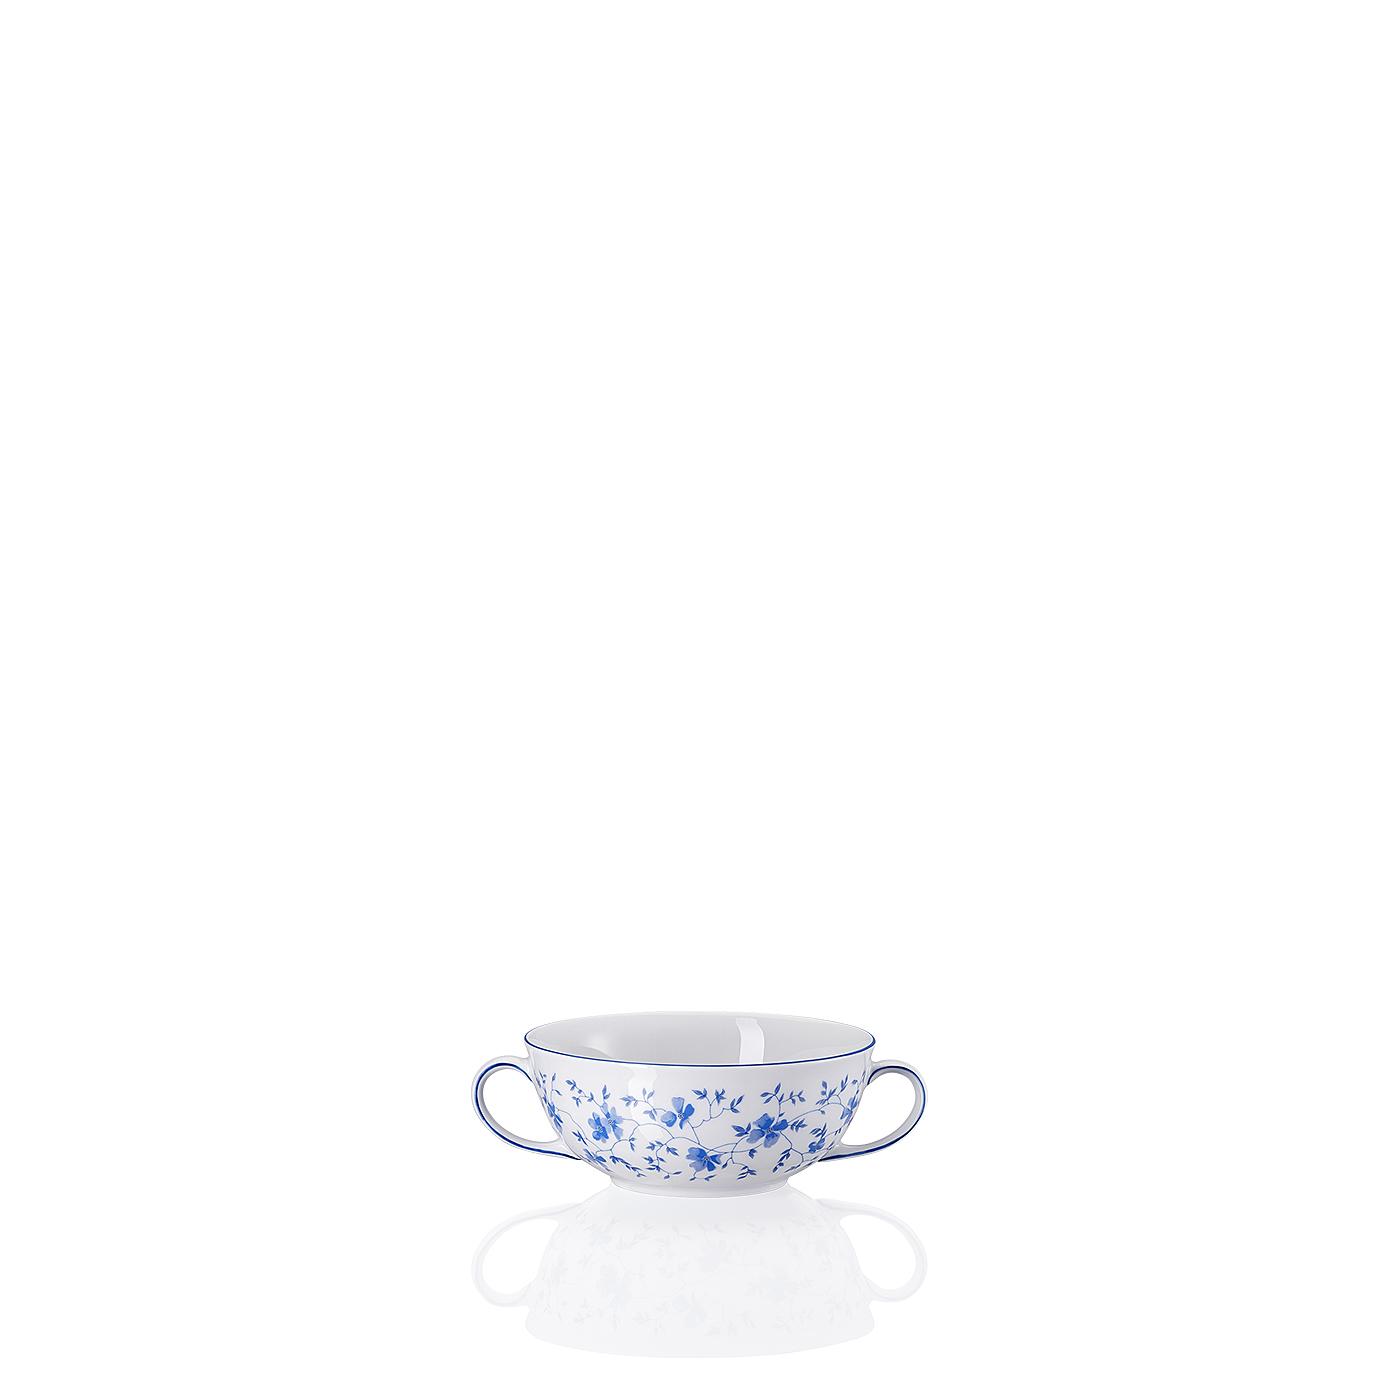 Suppen-Obertasse Form 1382 Blaublüten Arzberg